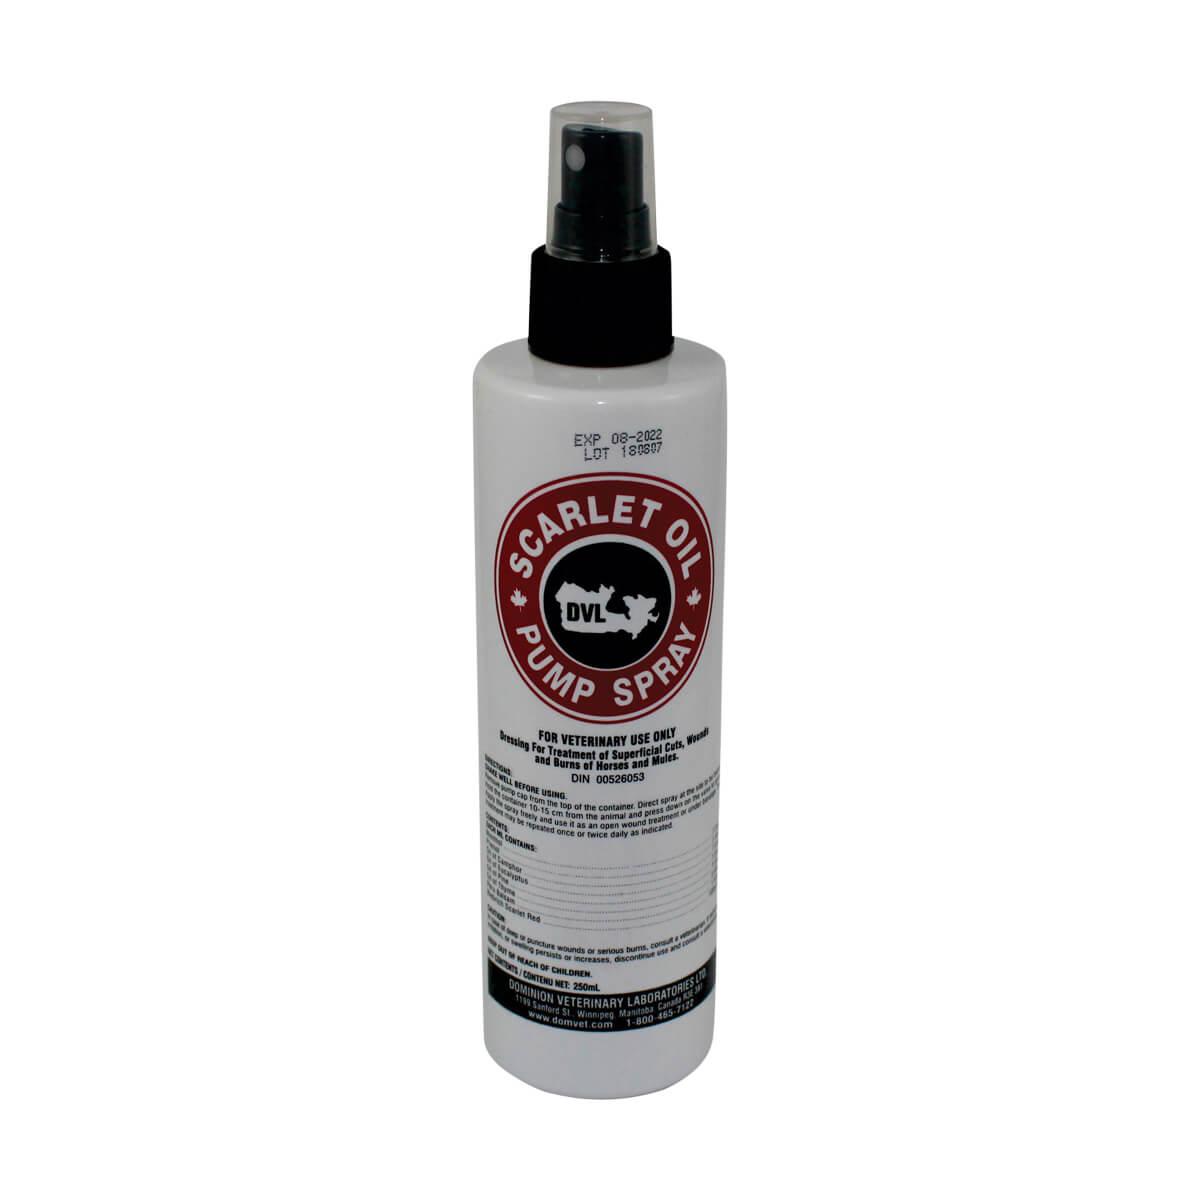 Scarlet Oil - 250 ml